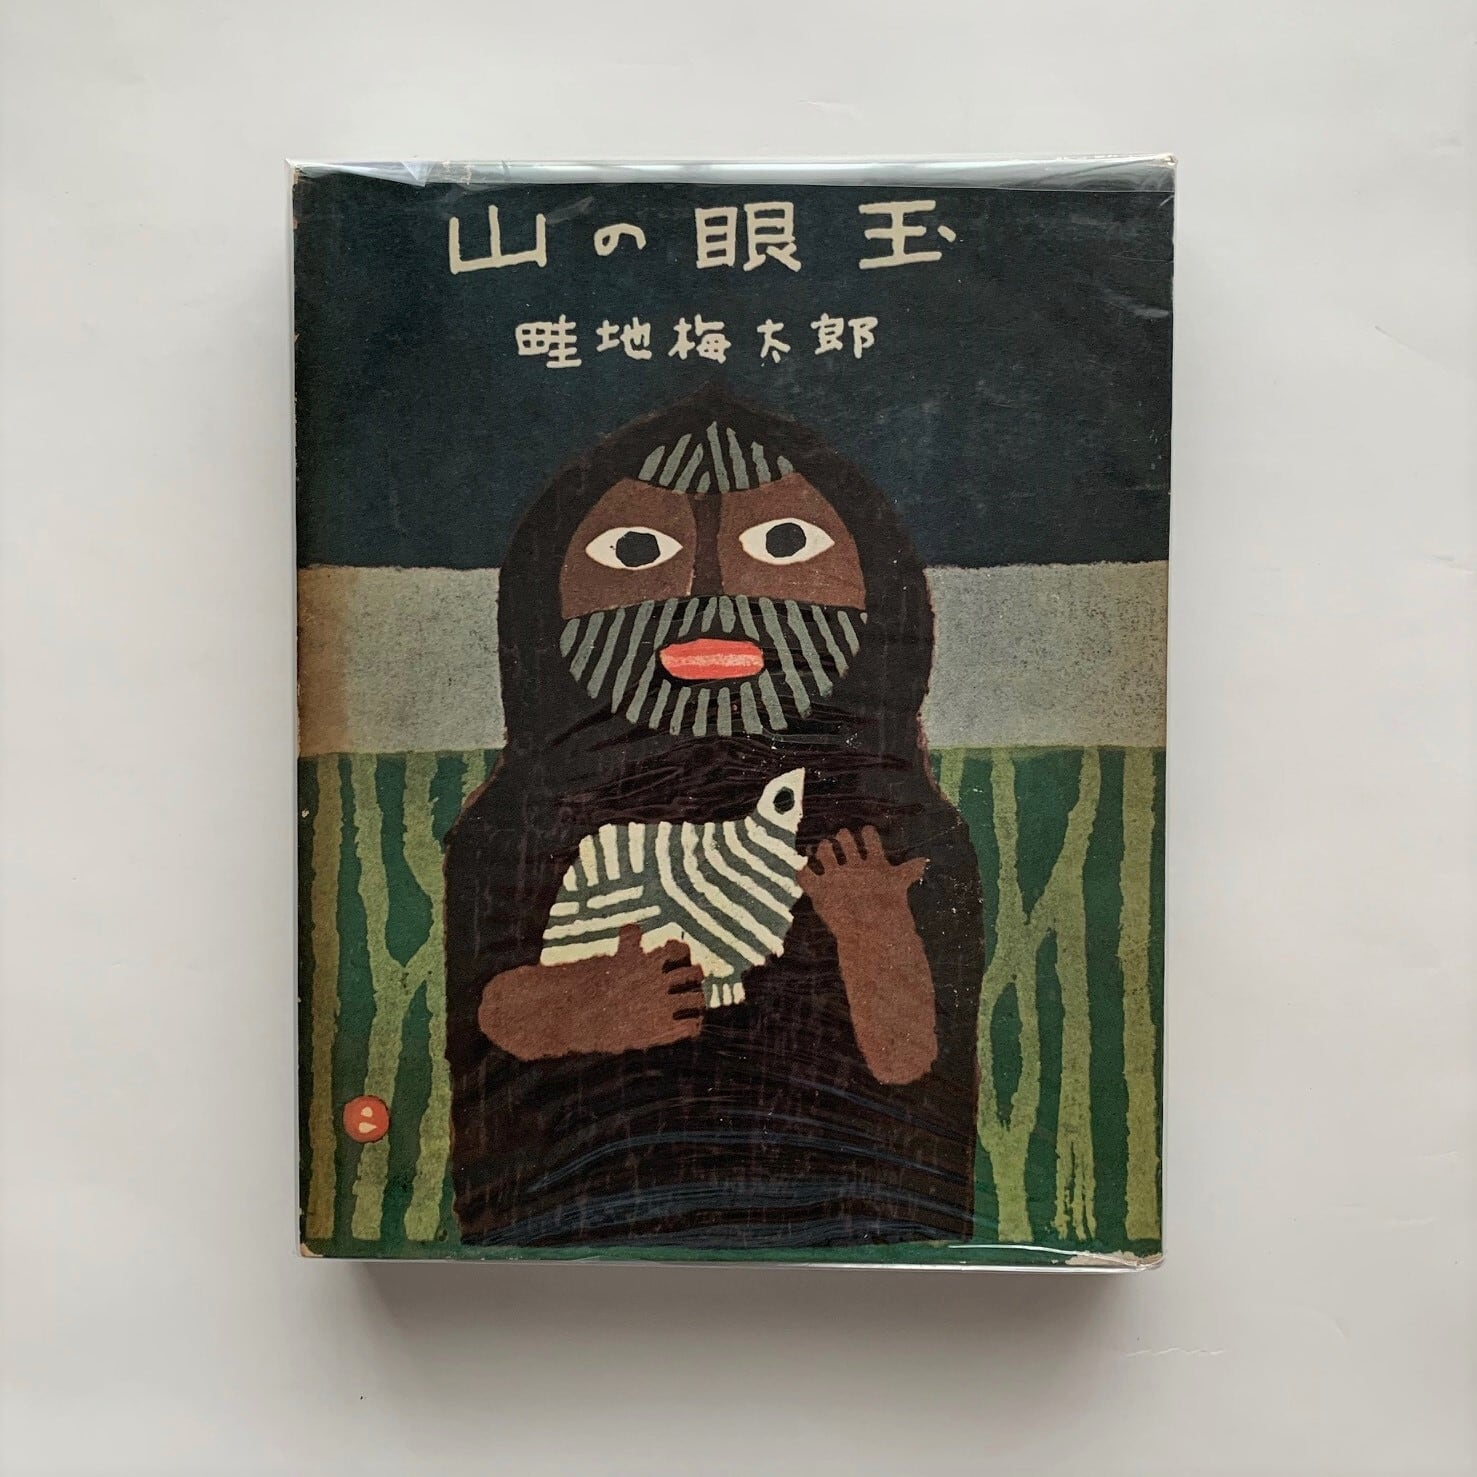 山の眼玉 / 畦地梅太郎